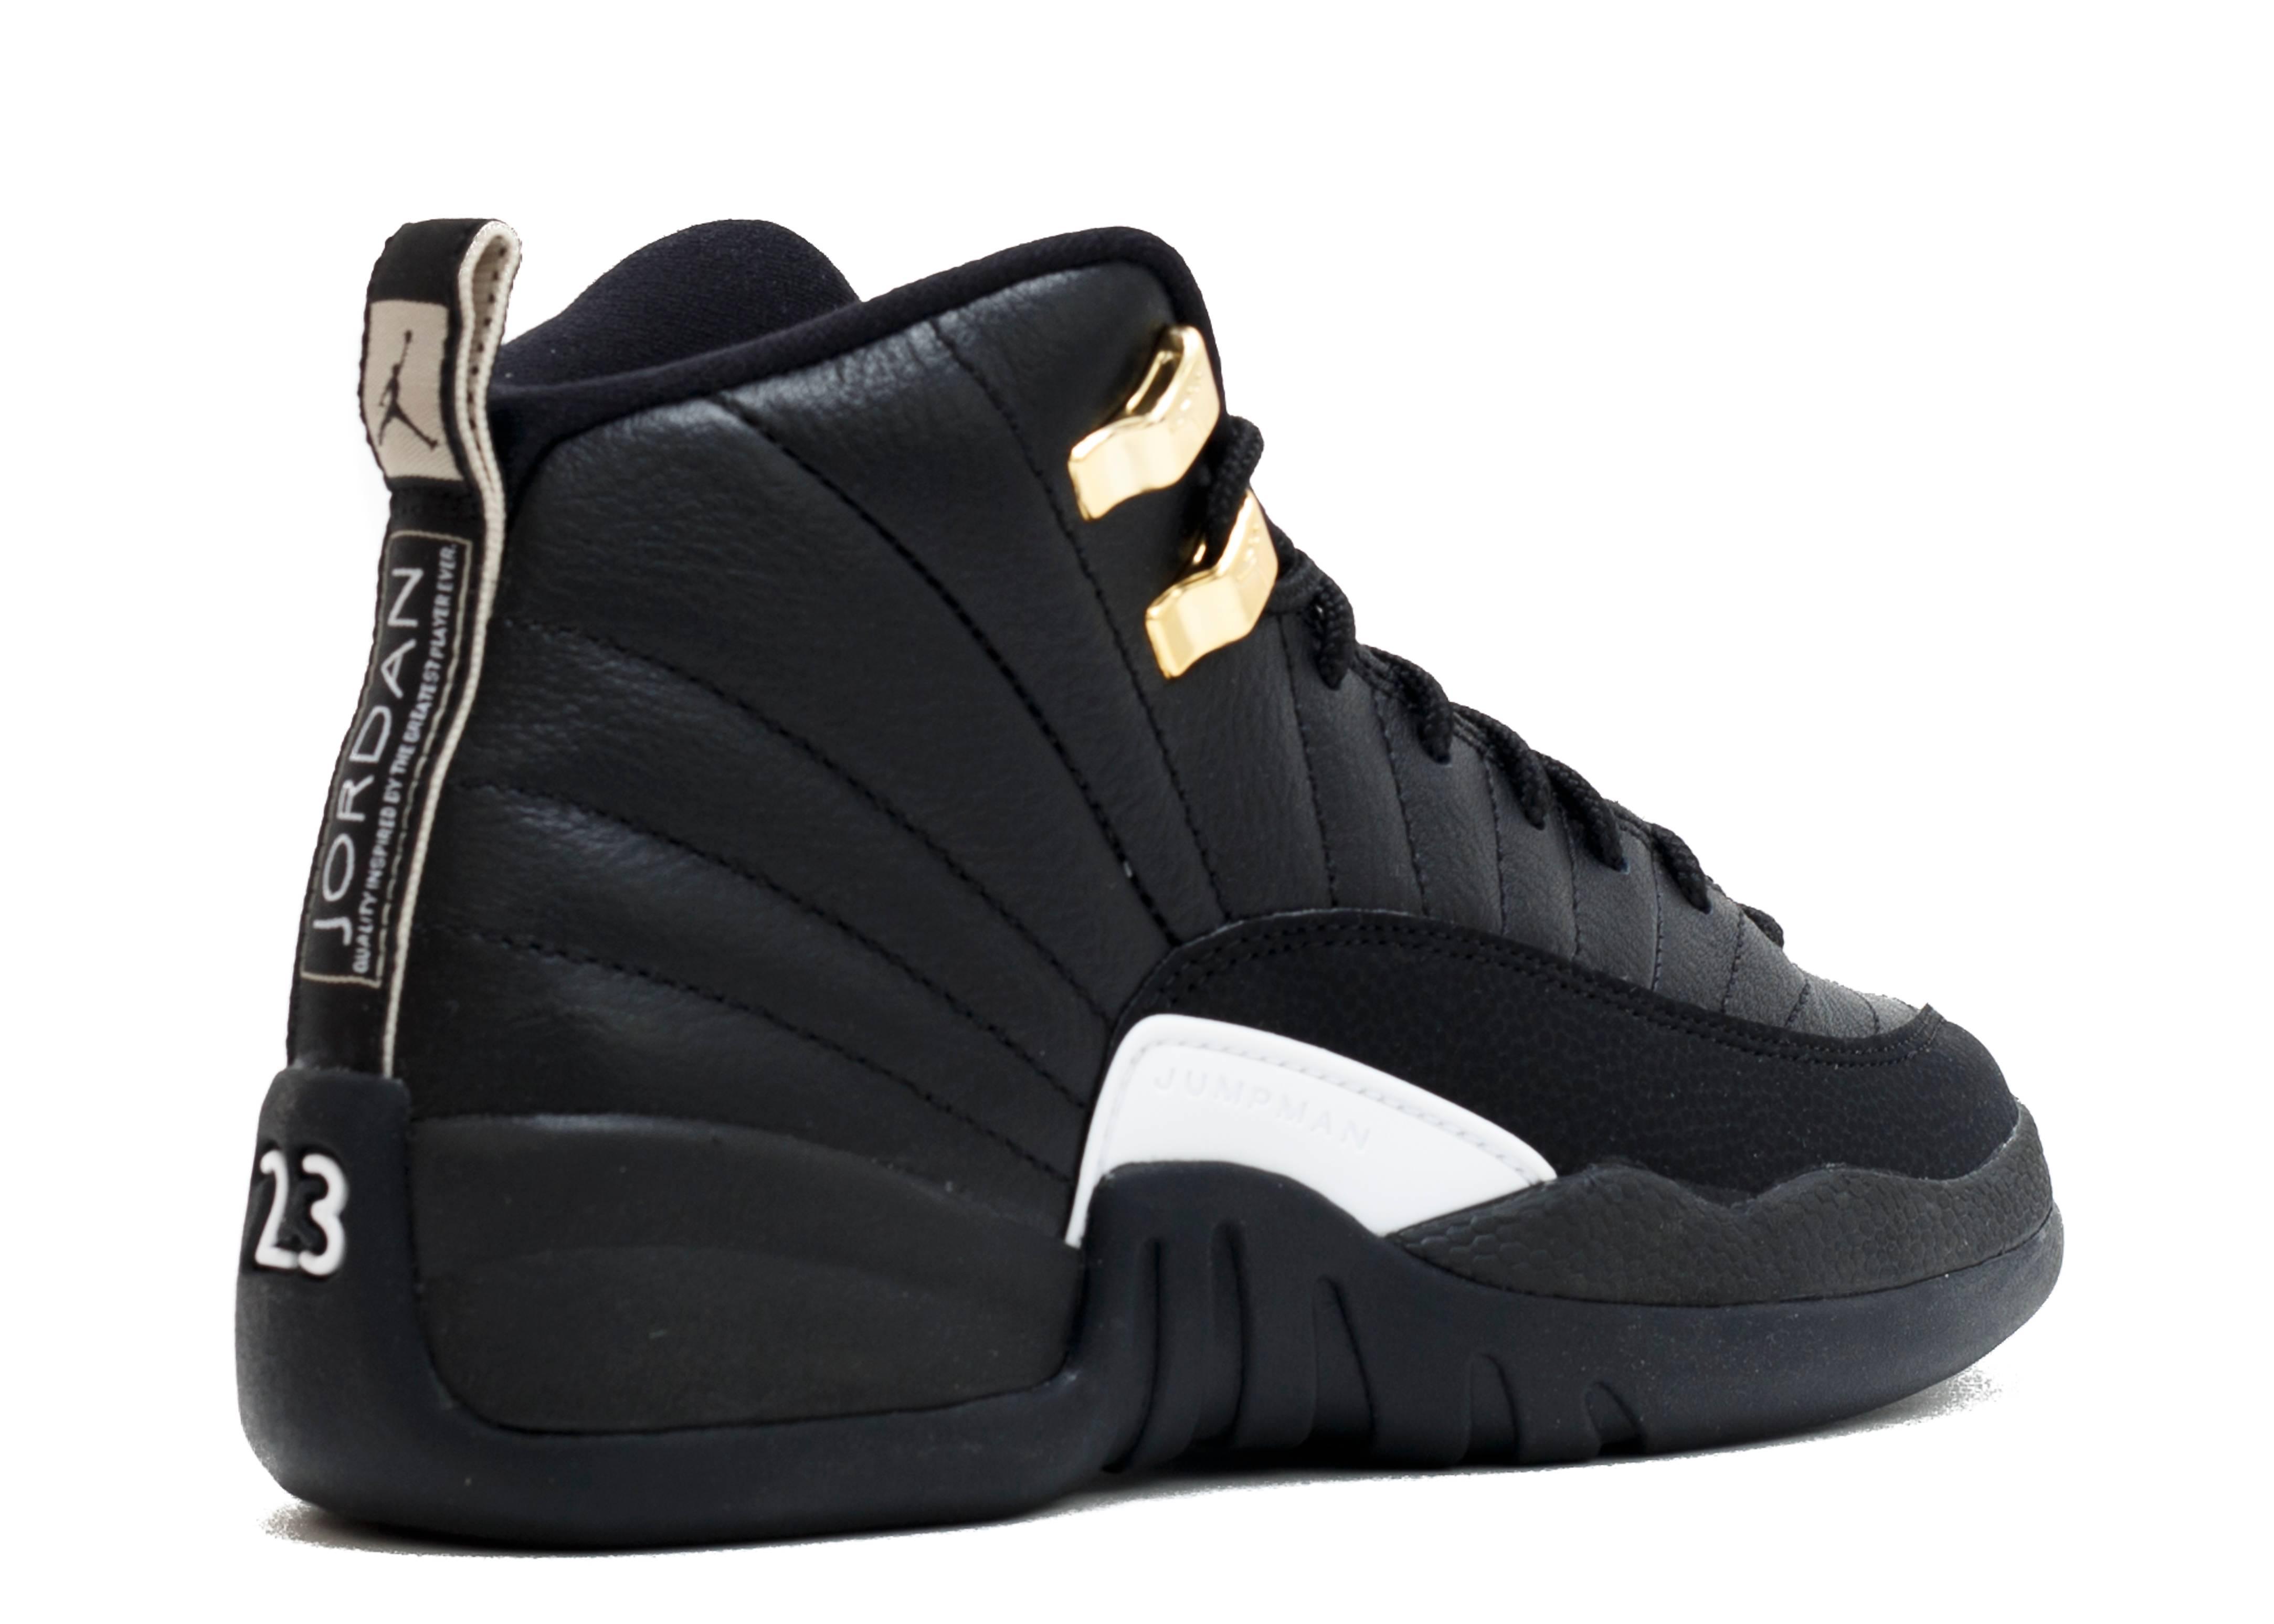 Nike Air Jordan 12 The Master